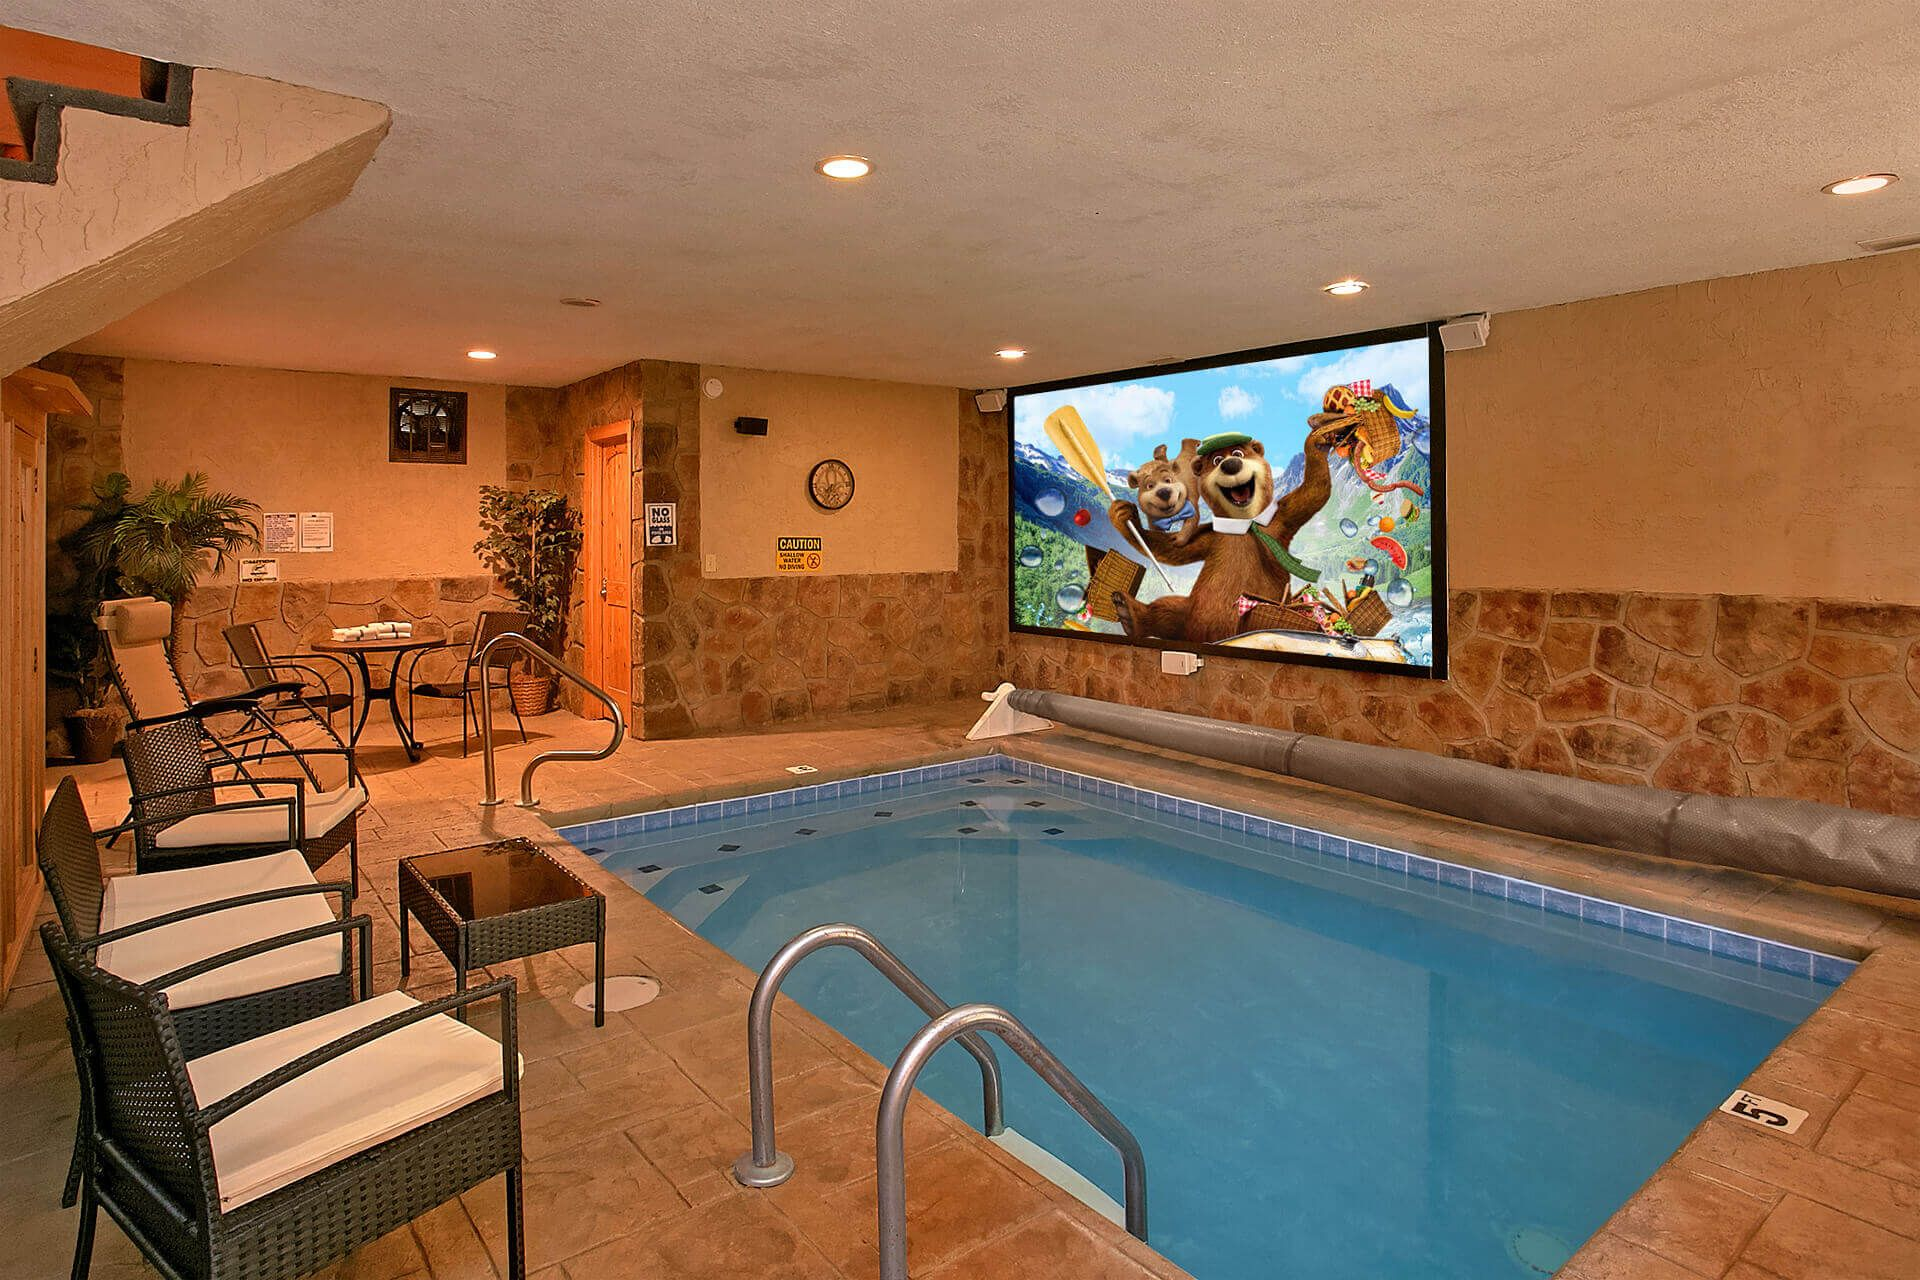 Gatlinburg Cabin Rentals In The Smoky Mountains Indoor Pool Design Small Indoor Pool Luxury Swimming Pools